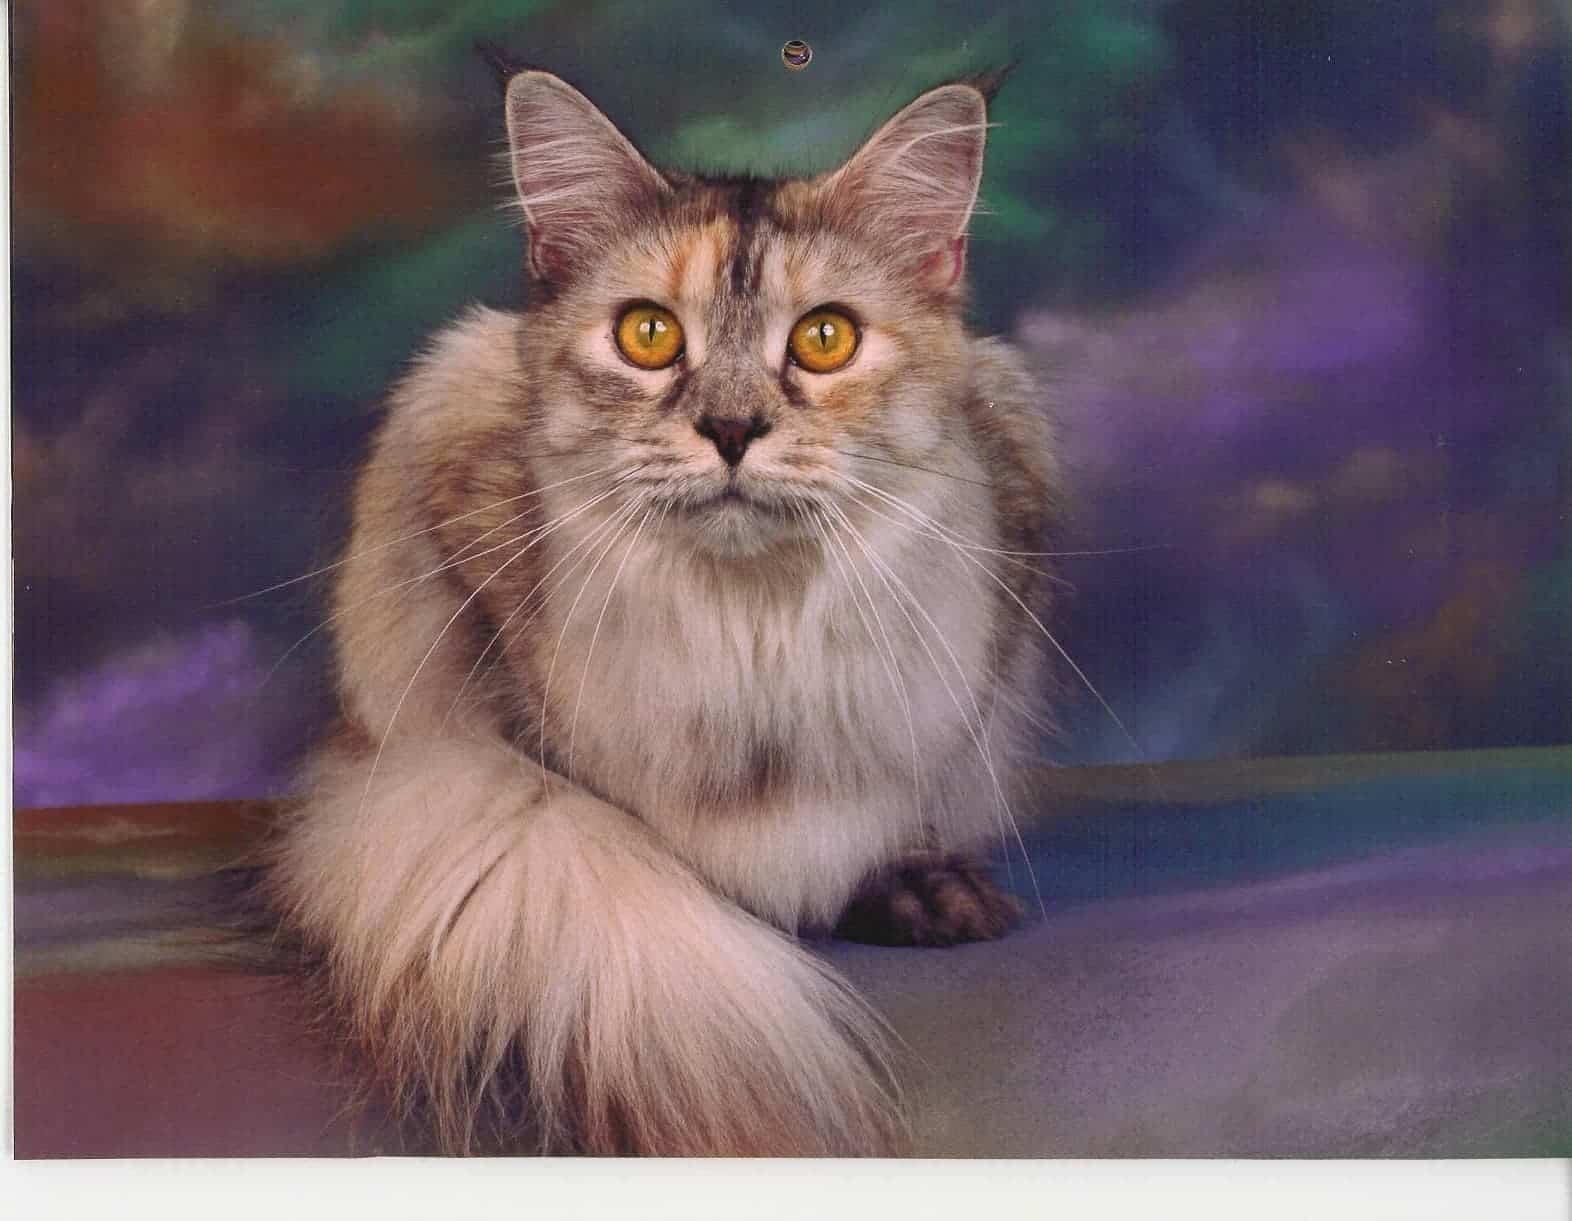 Samantha the Cat